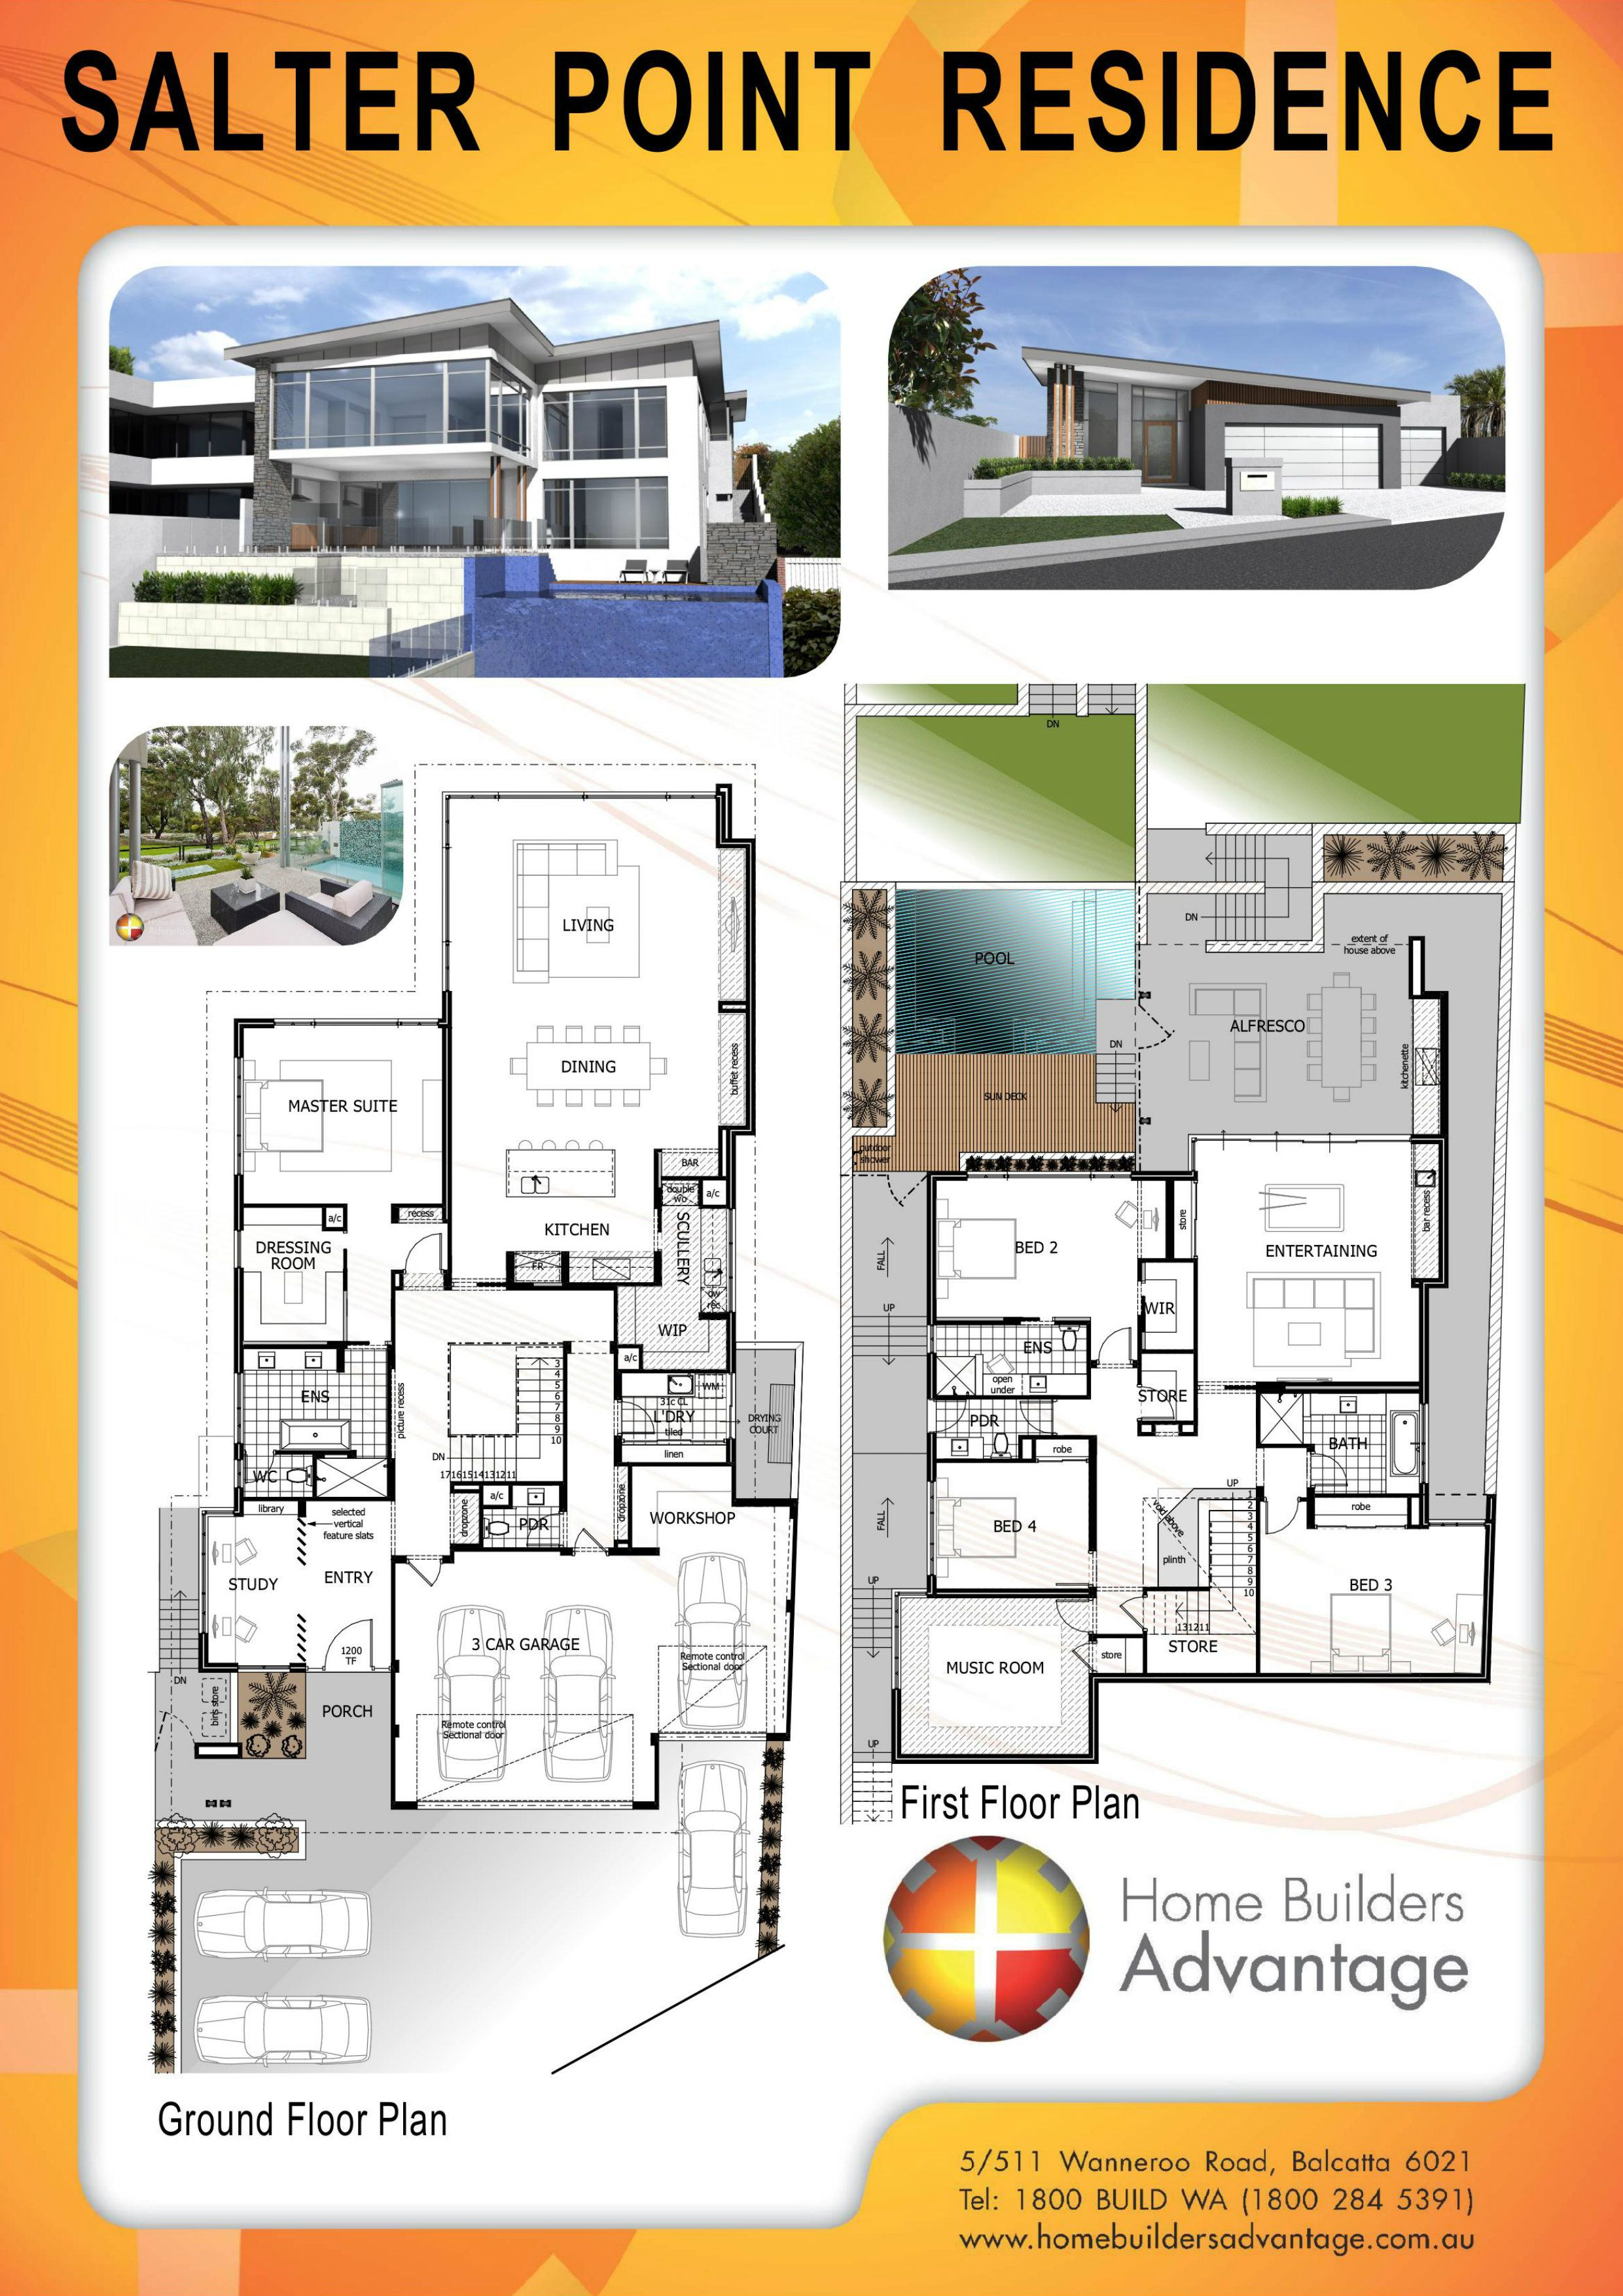 Homebuildersadvantage Com Au Wp Content Uploads 2016 12 Salter Point Residence Jpg New House Plans Split Level House Plans Floor Plans